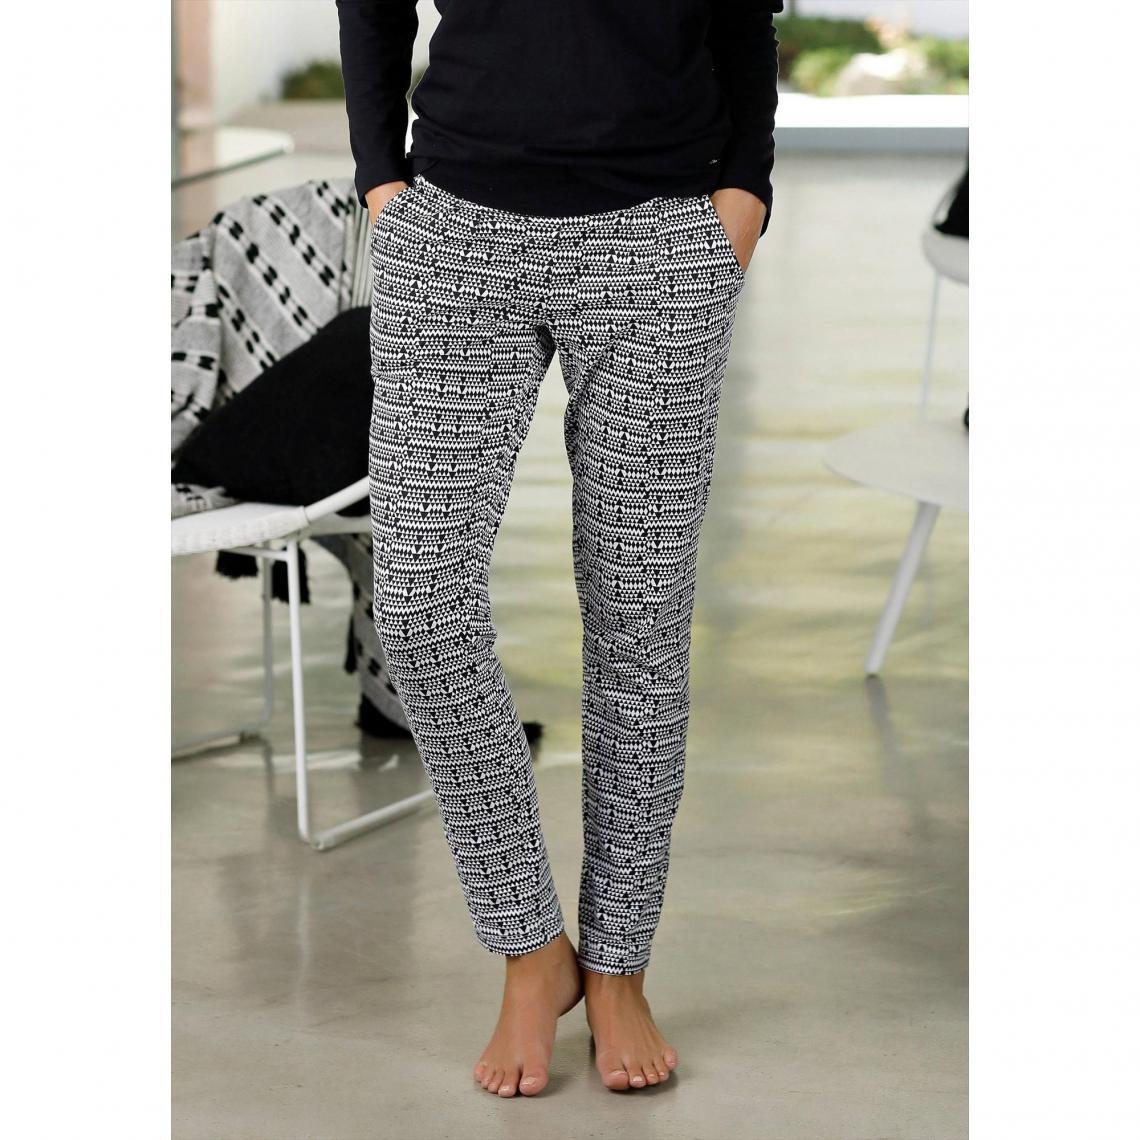 6163906742e50 Pantalon de pyjama femme s.Oliver - Blanc - Gris S.Oliver Lingerie femme